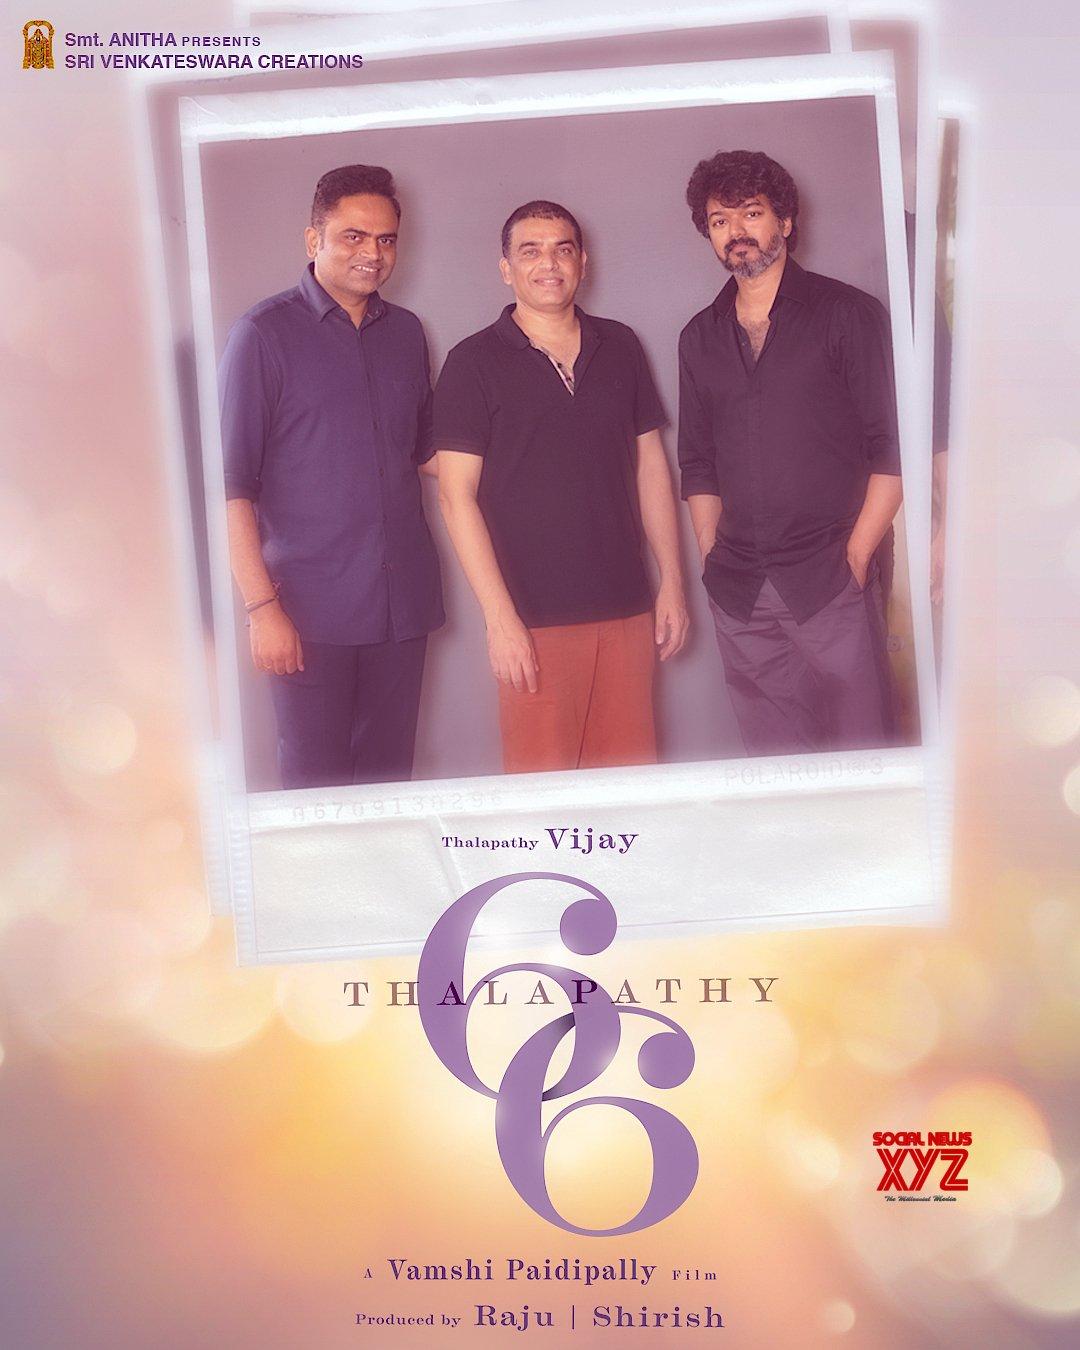 Thalapathy Vijay's 66th Film With Vamshi Paidipally And Dil Raju